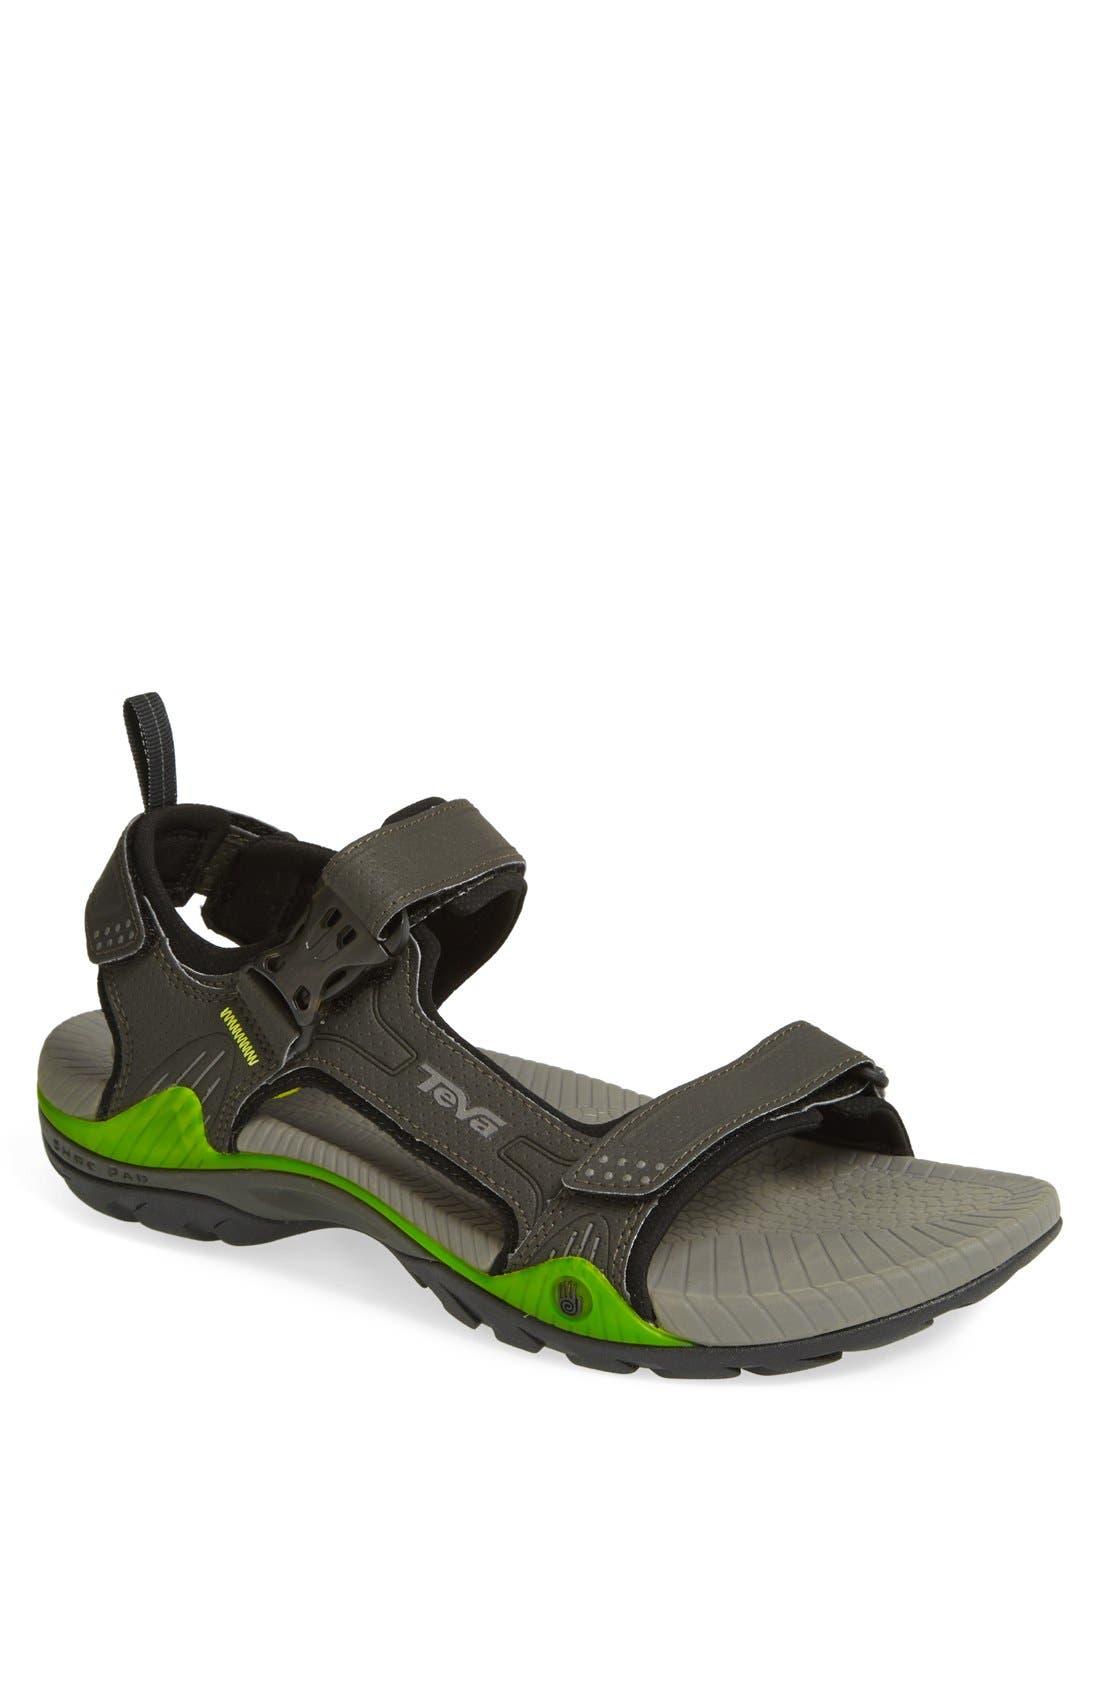 Alternate Image 1 Selected - Teva 'Toachi 2' Sandal (Men)